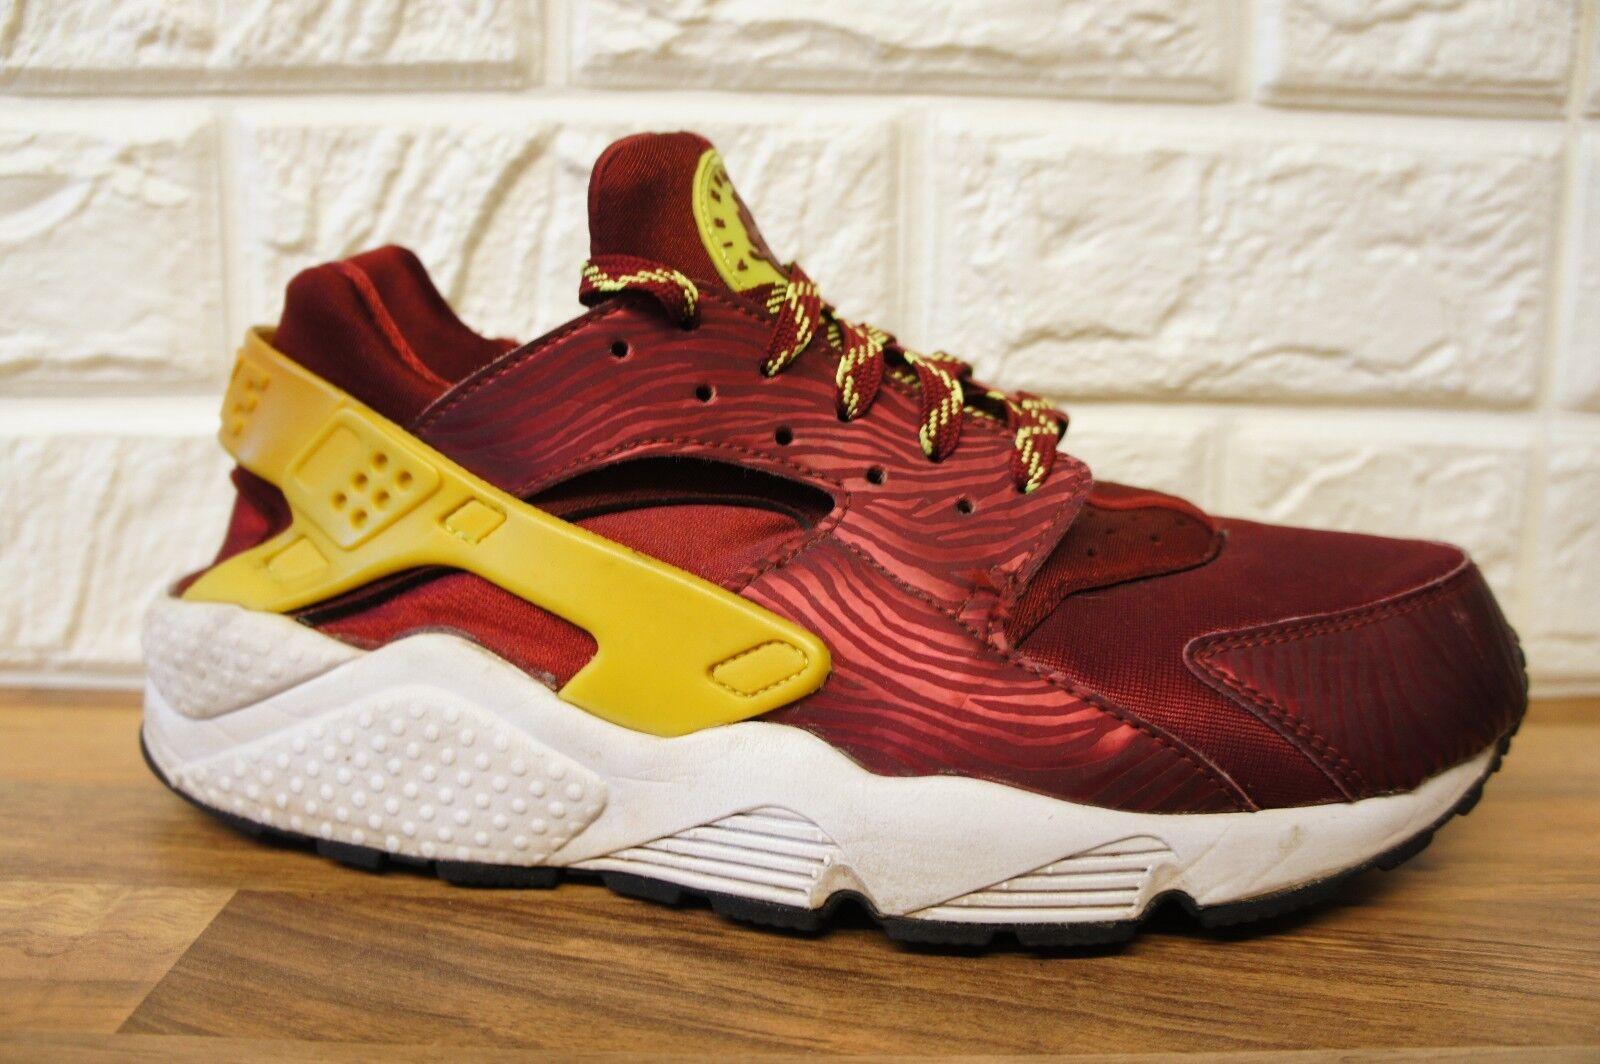 Nike Nike Nike Air Huarache Run Da Donna Taglia 5 Rosso oro Bianco Corsa Palestra Scarpe da ginnastica Donna | Discount  b60c9f